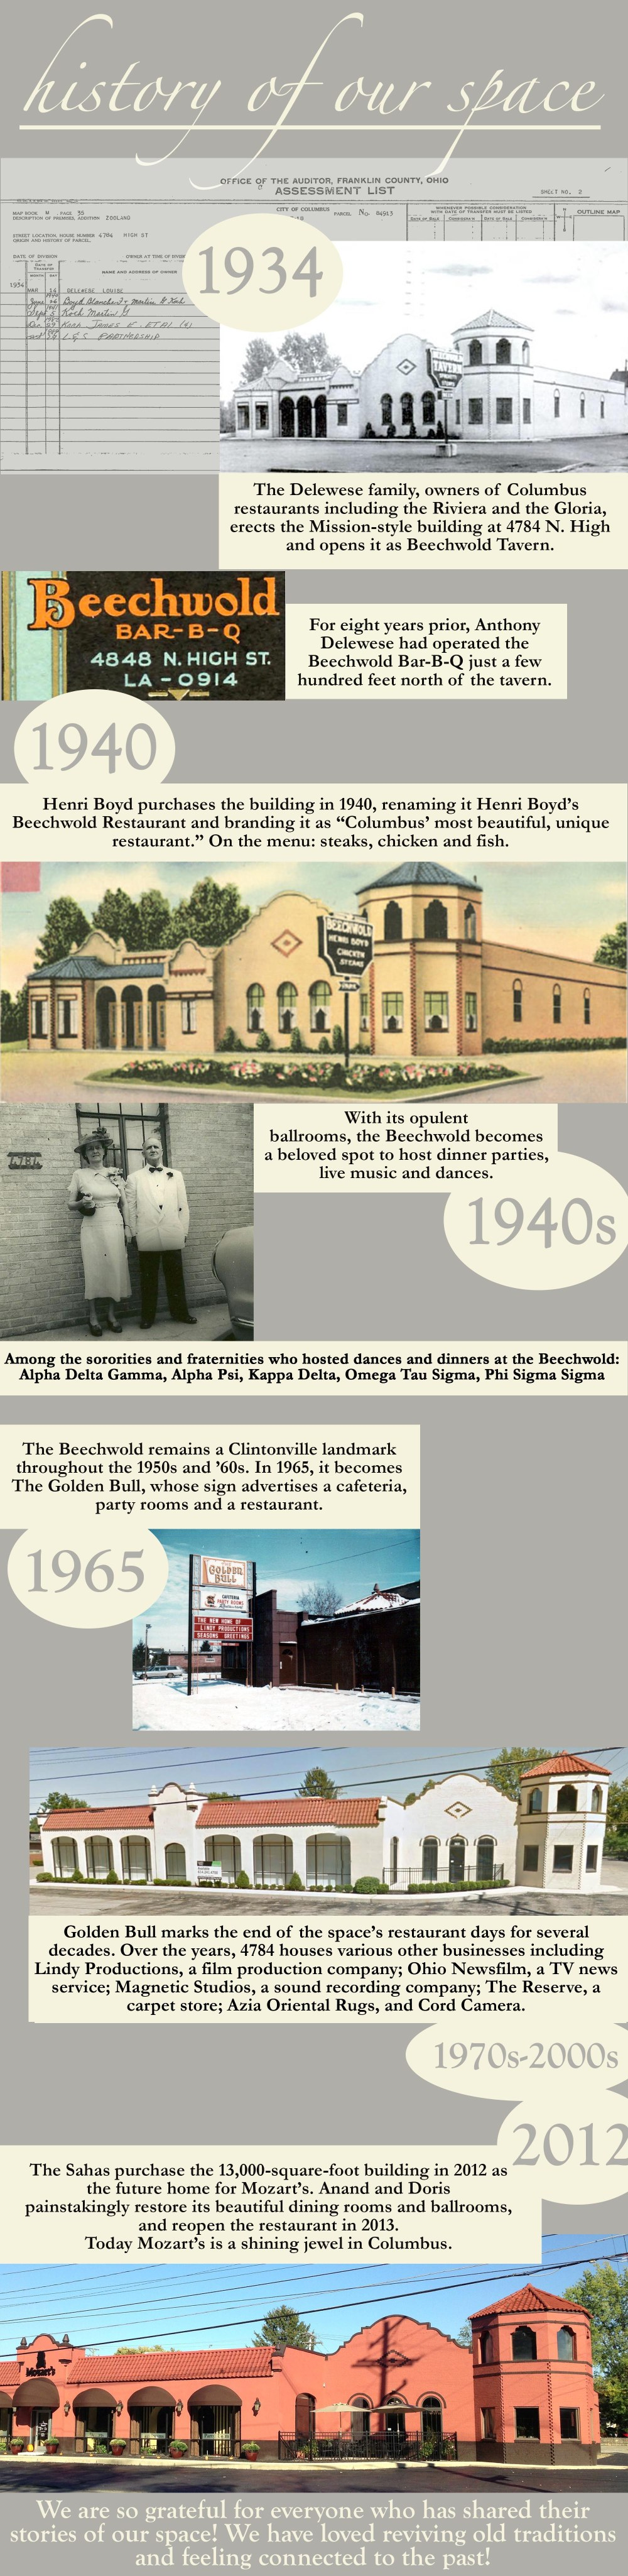 mozarts-history-web-final